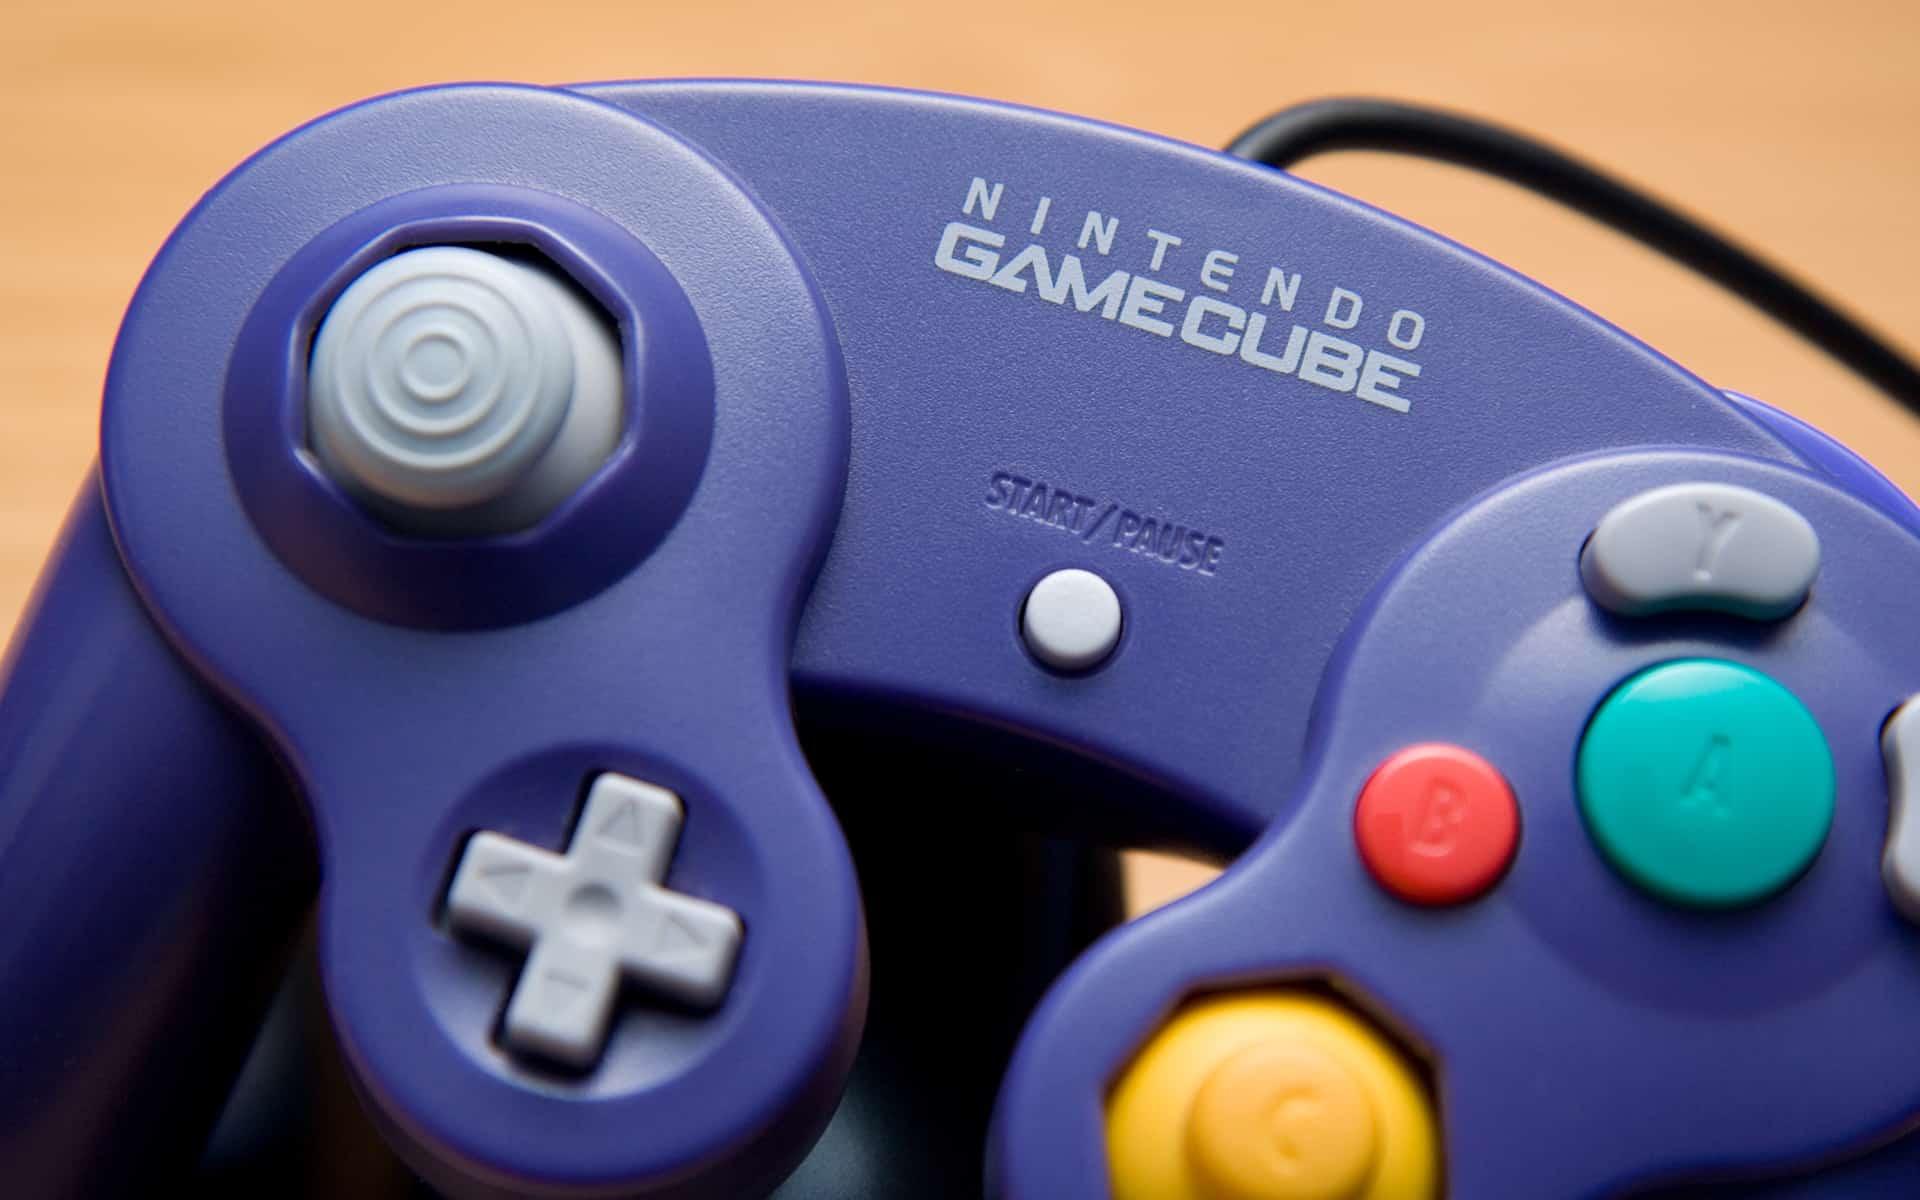 virtual console nintendo gamecube